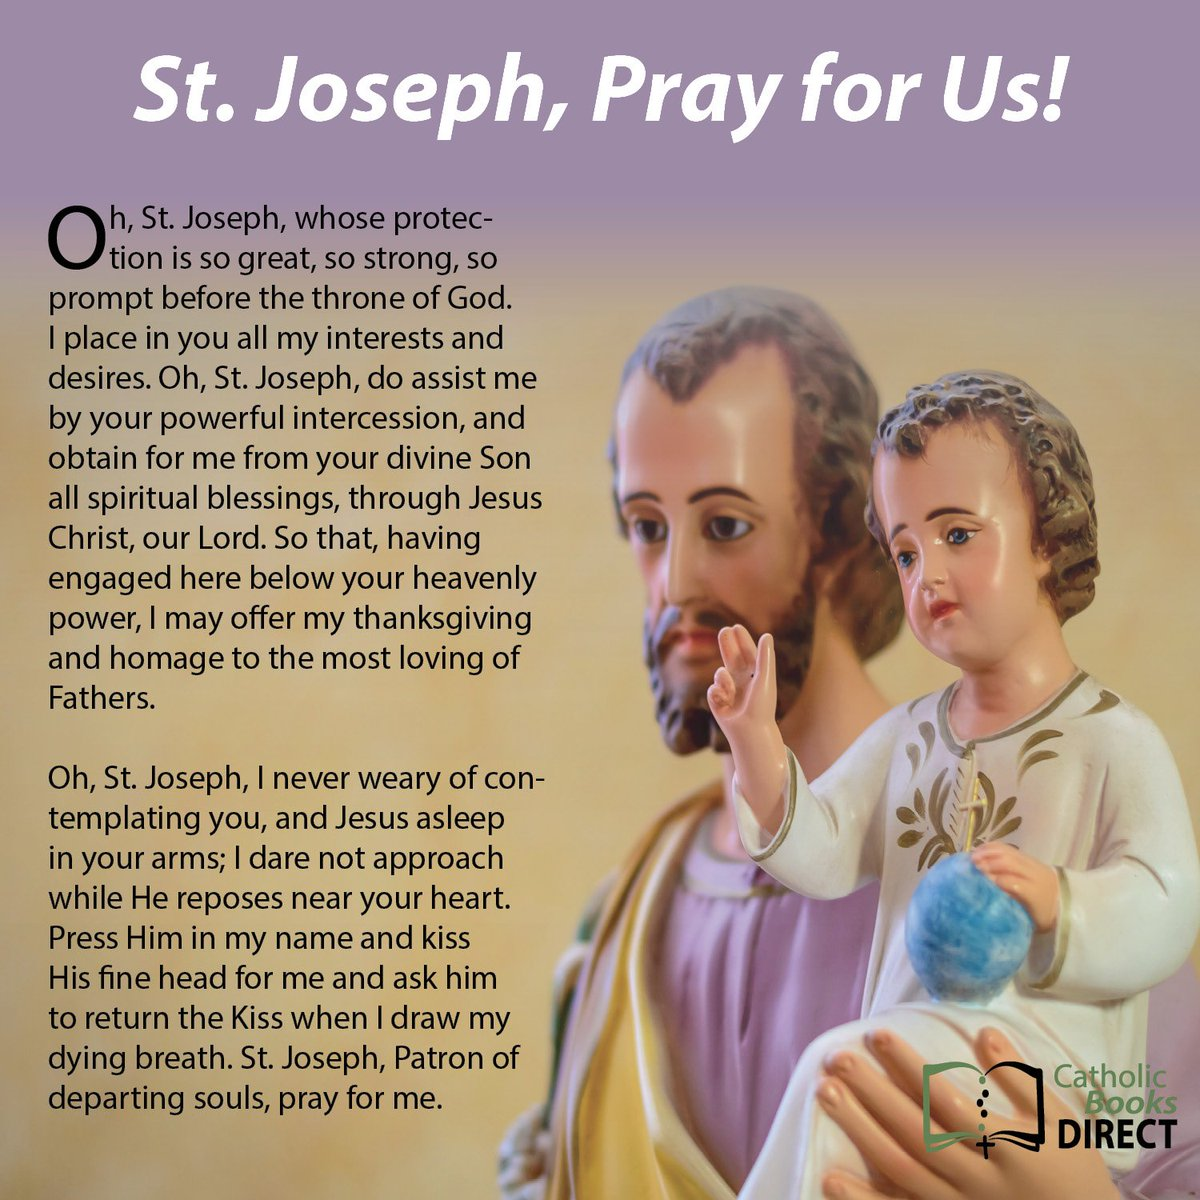 #StJoseph, #pray for us! #Catholic #FeastDay #StJosephsDay